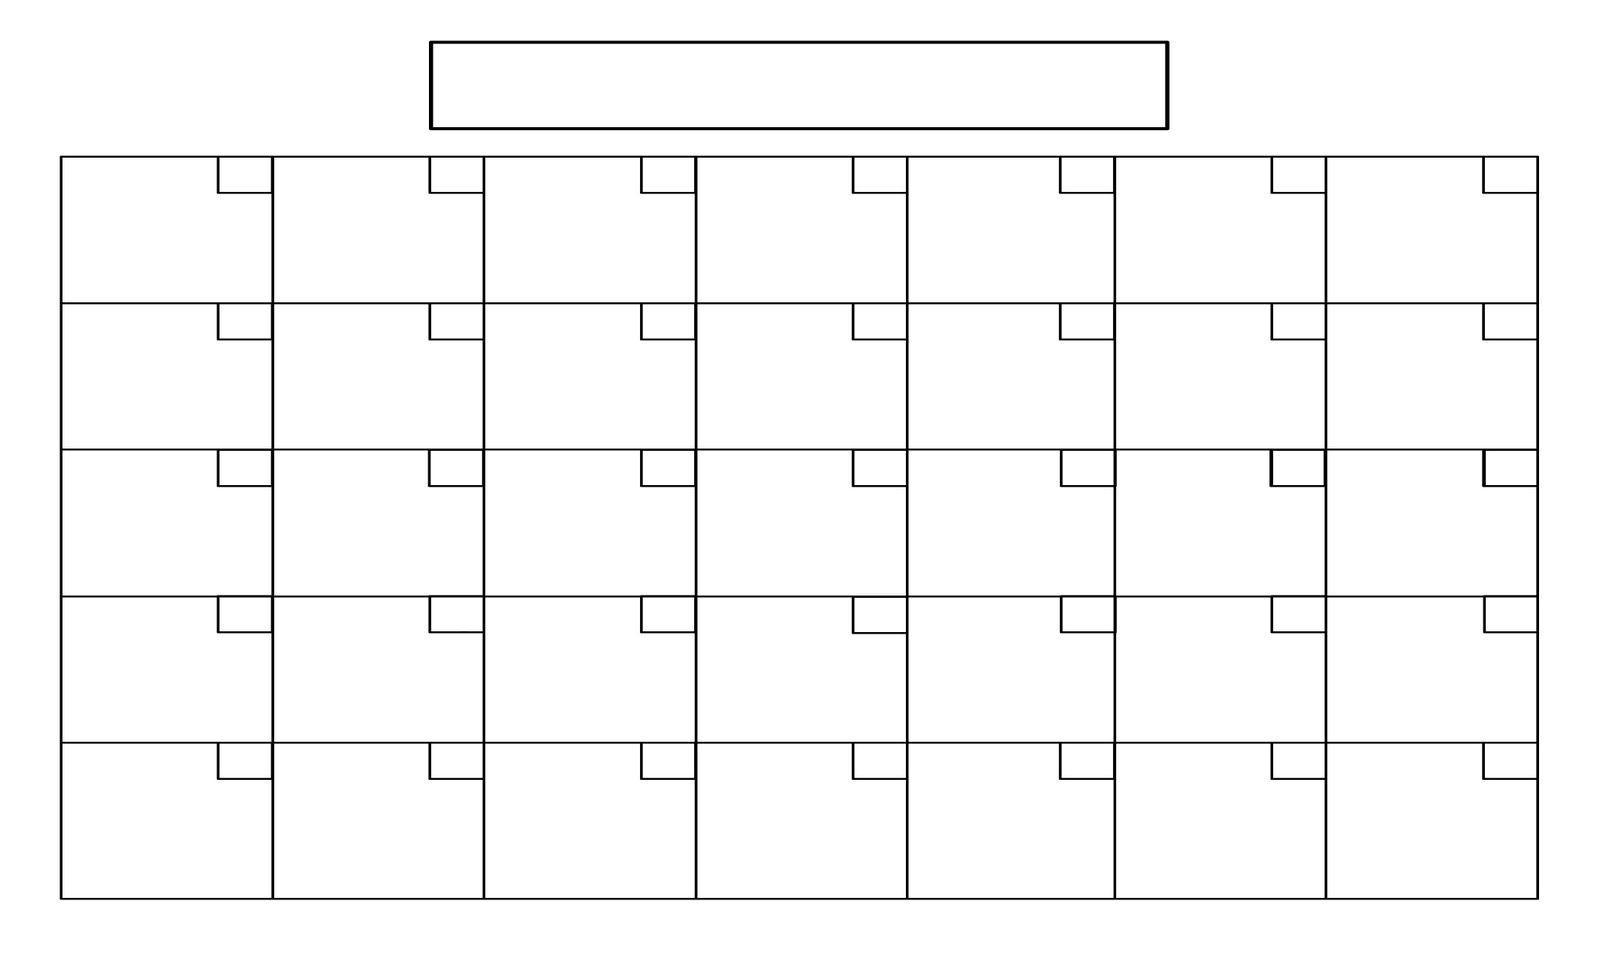 8.5 X 14 Calendar Template | Blank Calendar Pages, Blank